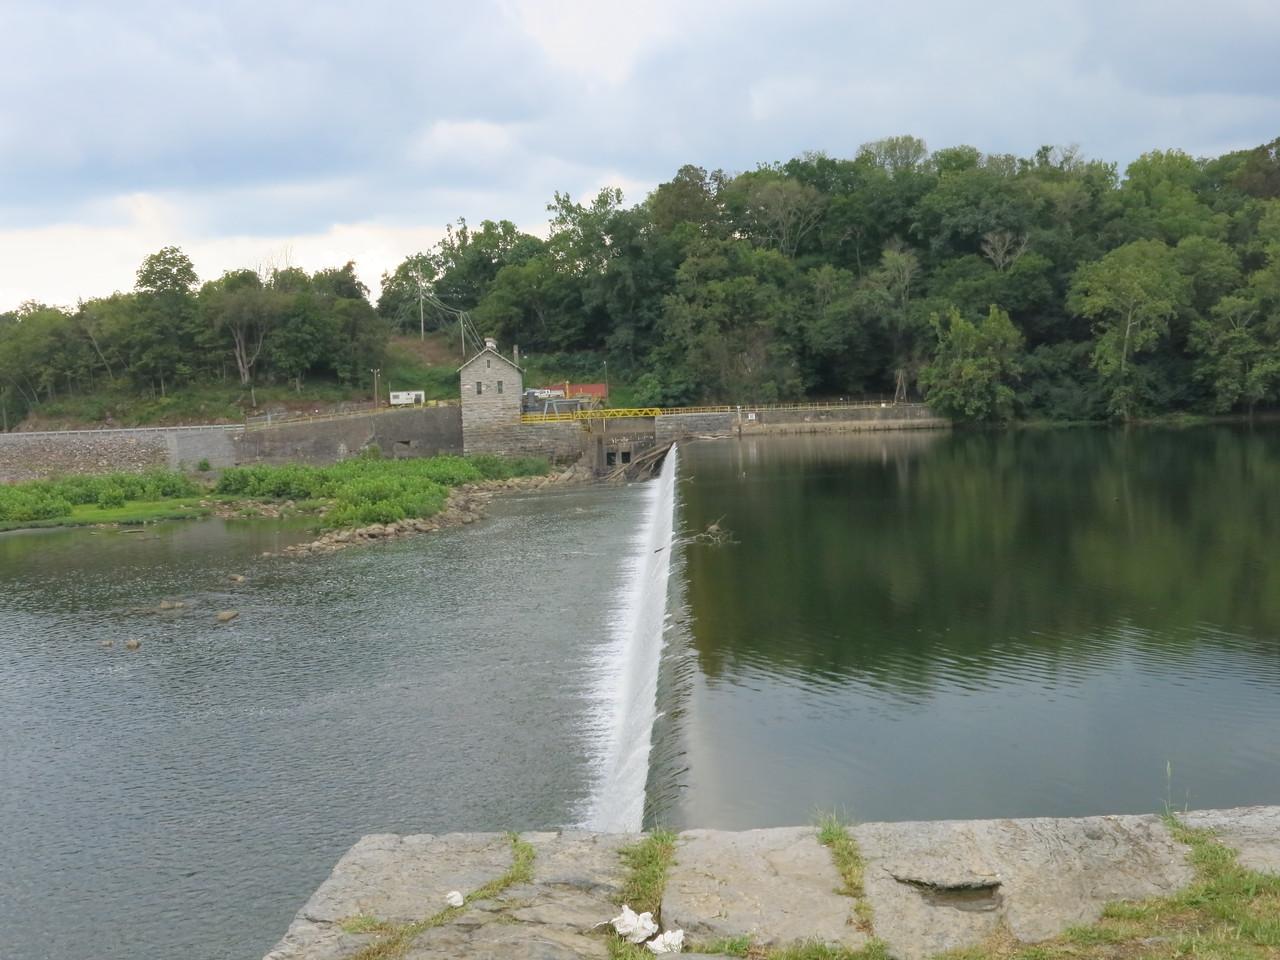 Dam 4 at MP 84.4